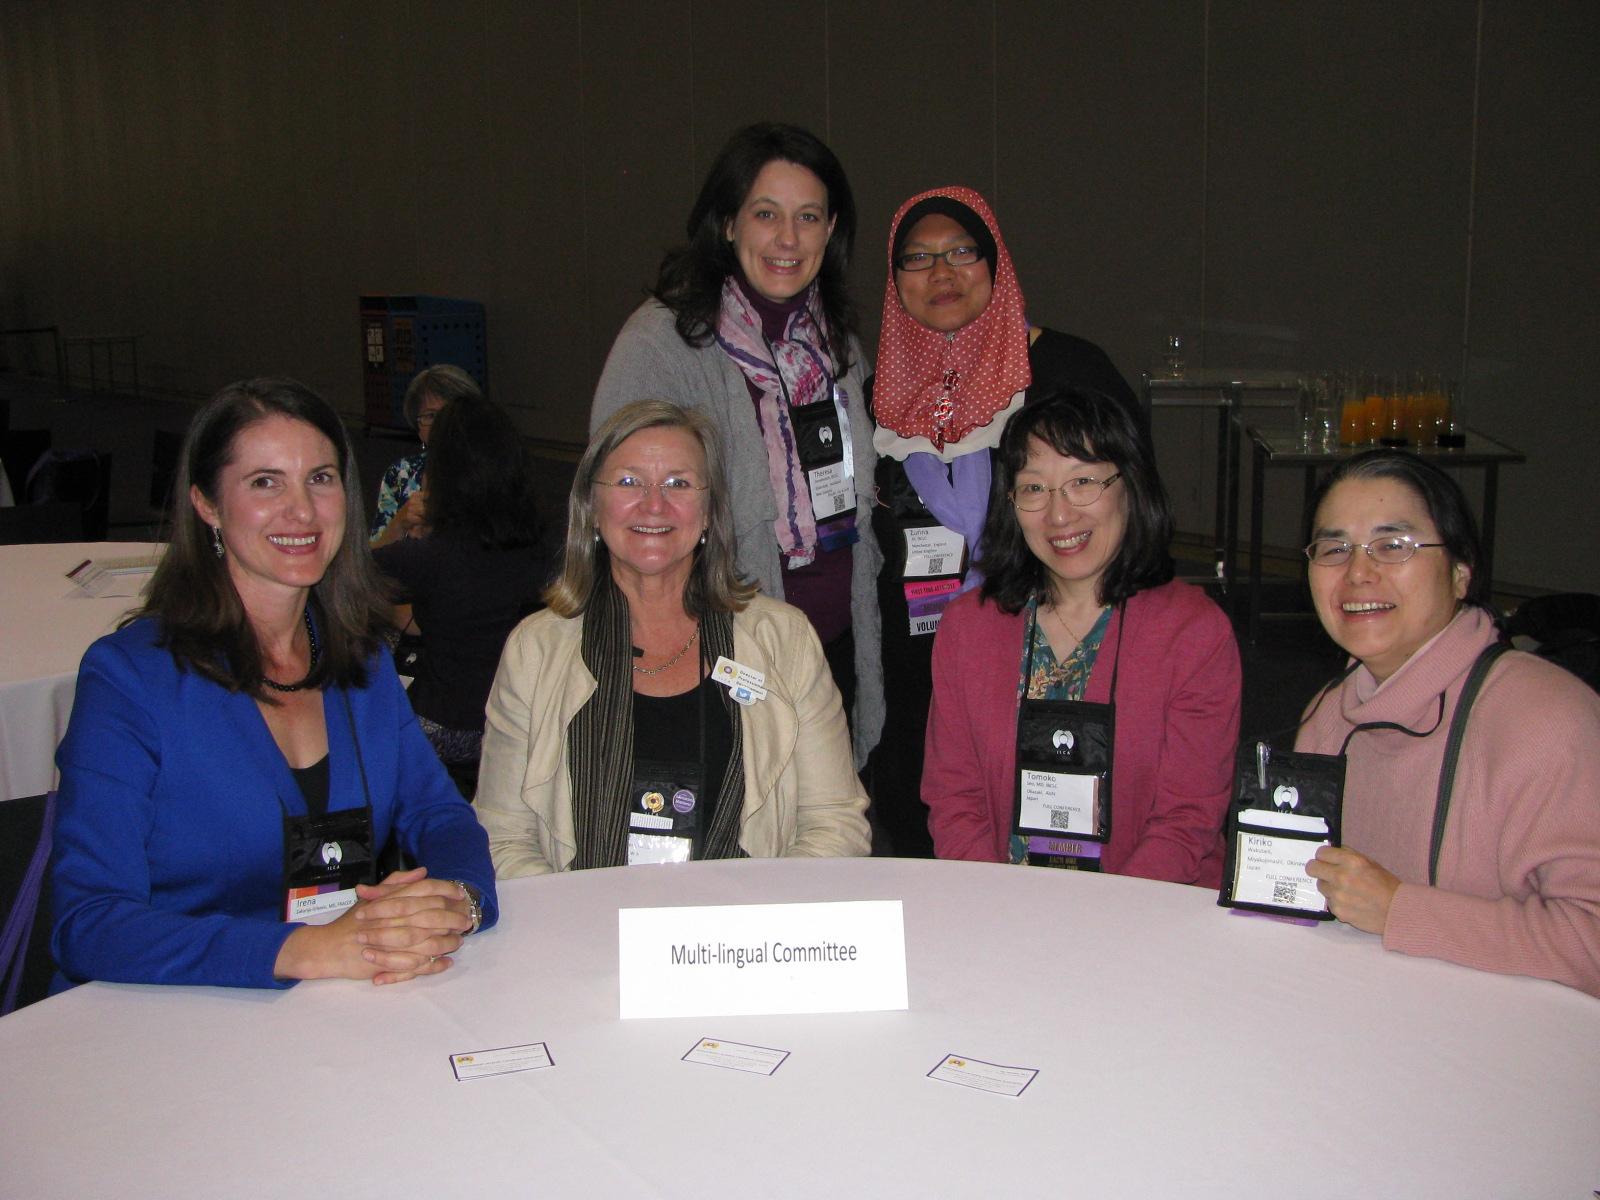 ILCA's Multi-Lingual Committee